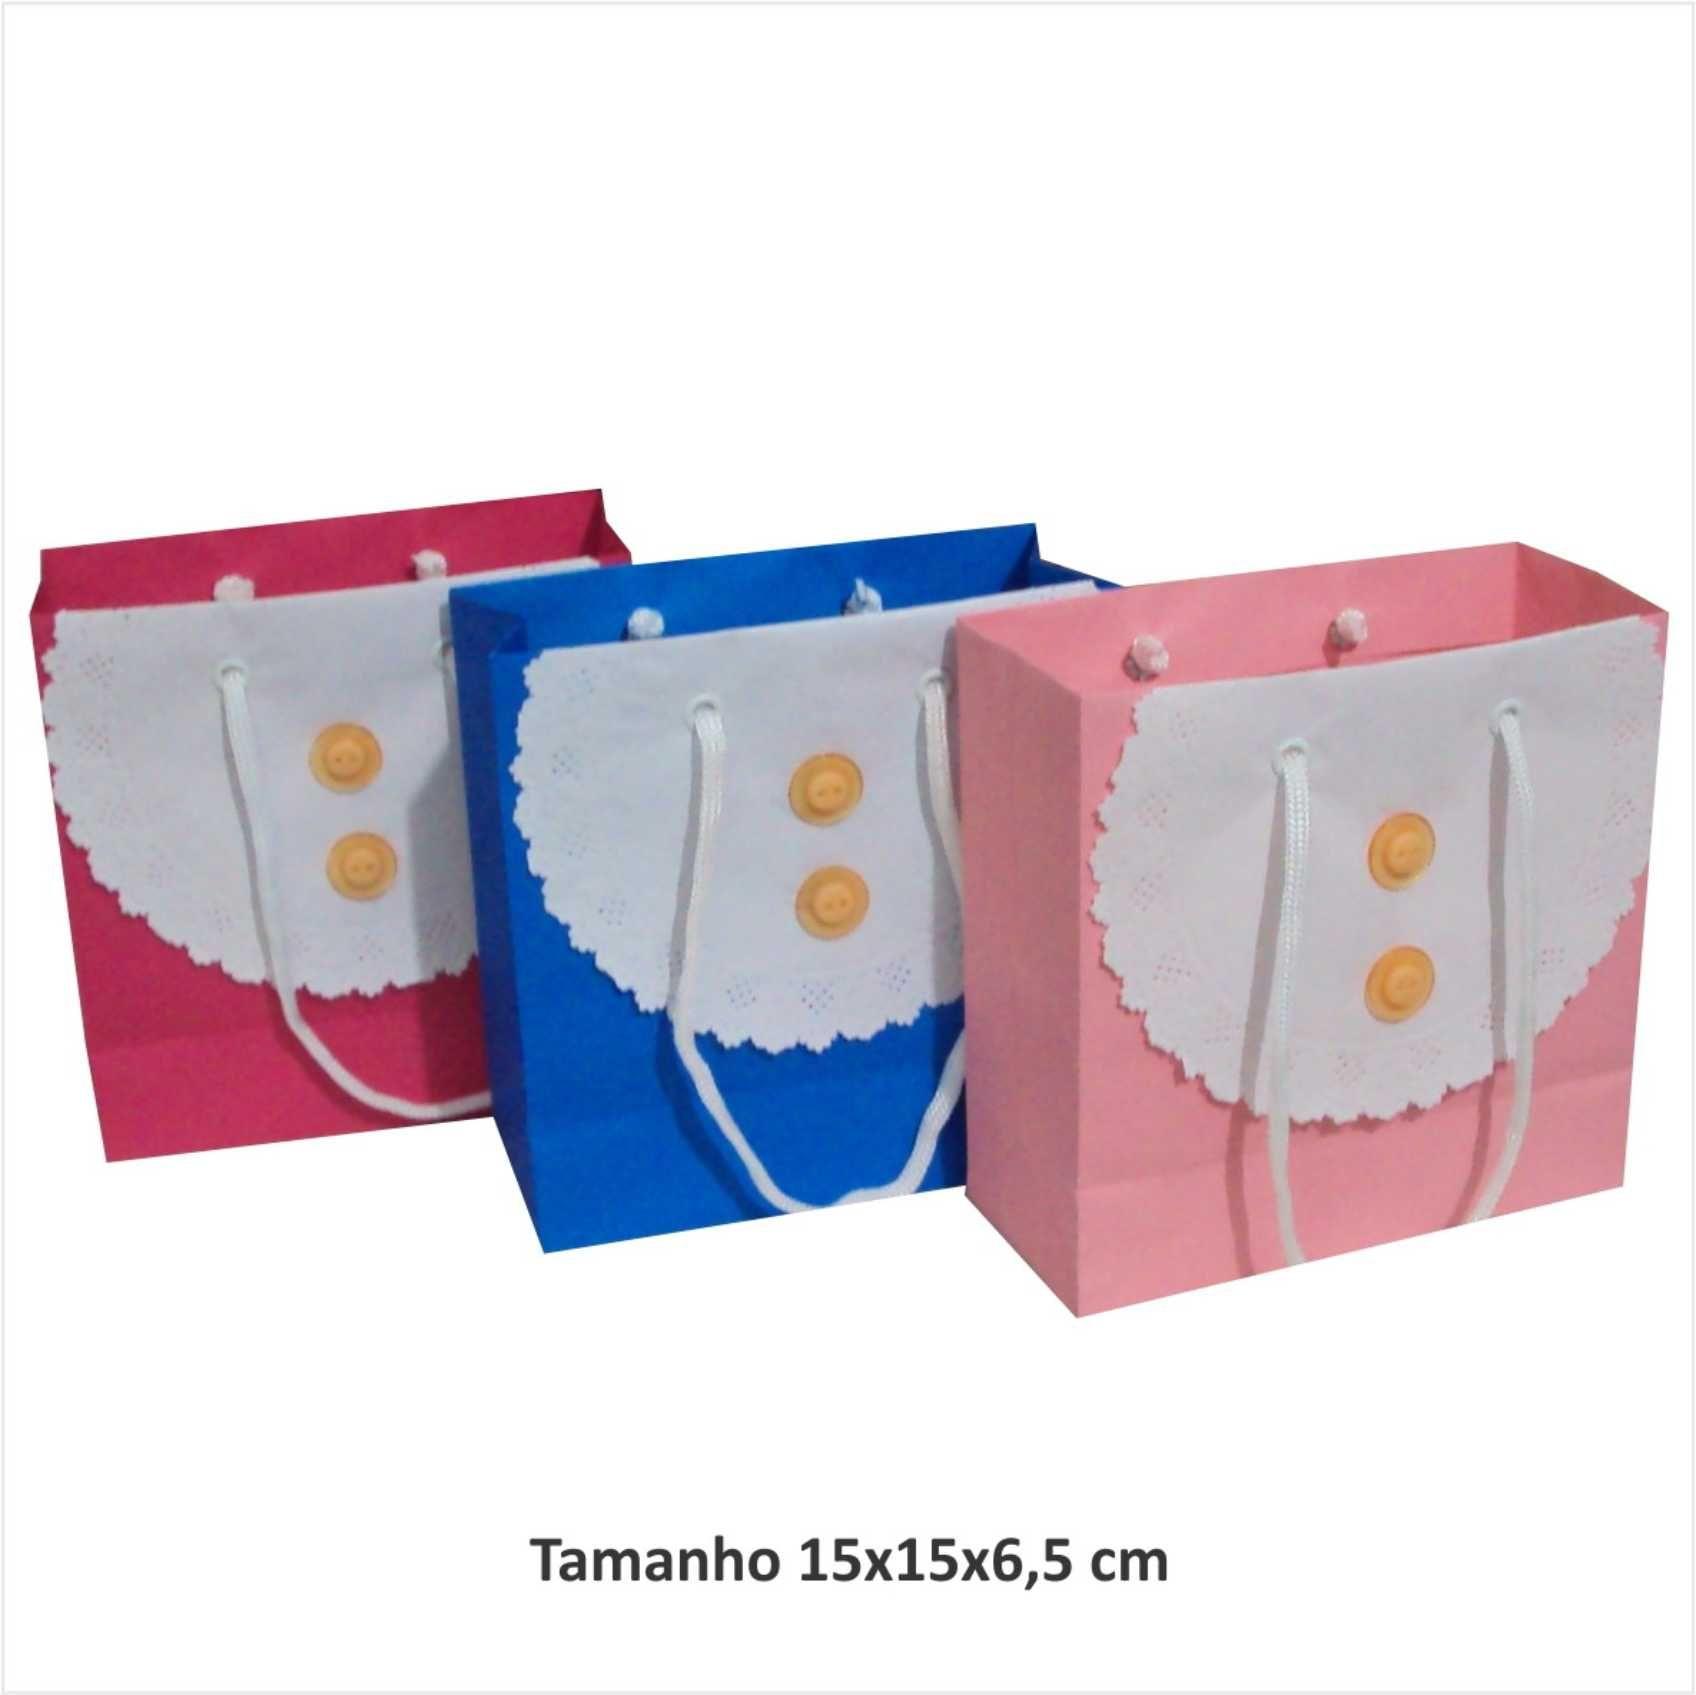 Sacola de papel Pequena - colorida - com papel rendado (15x15x6,5 cm)  - 10 unidades